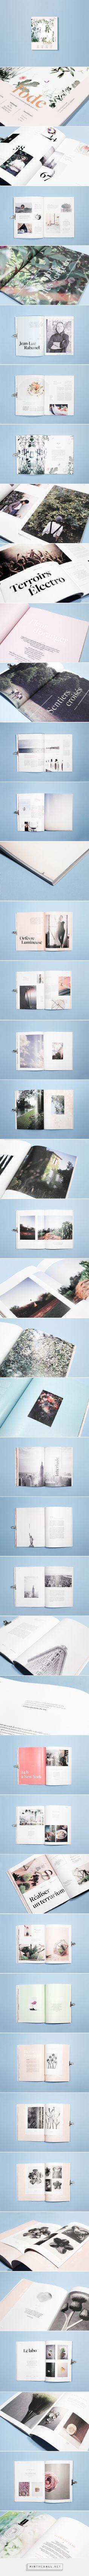 l'ode magazine - diptyque by Julie Ferrieux